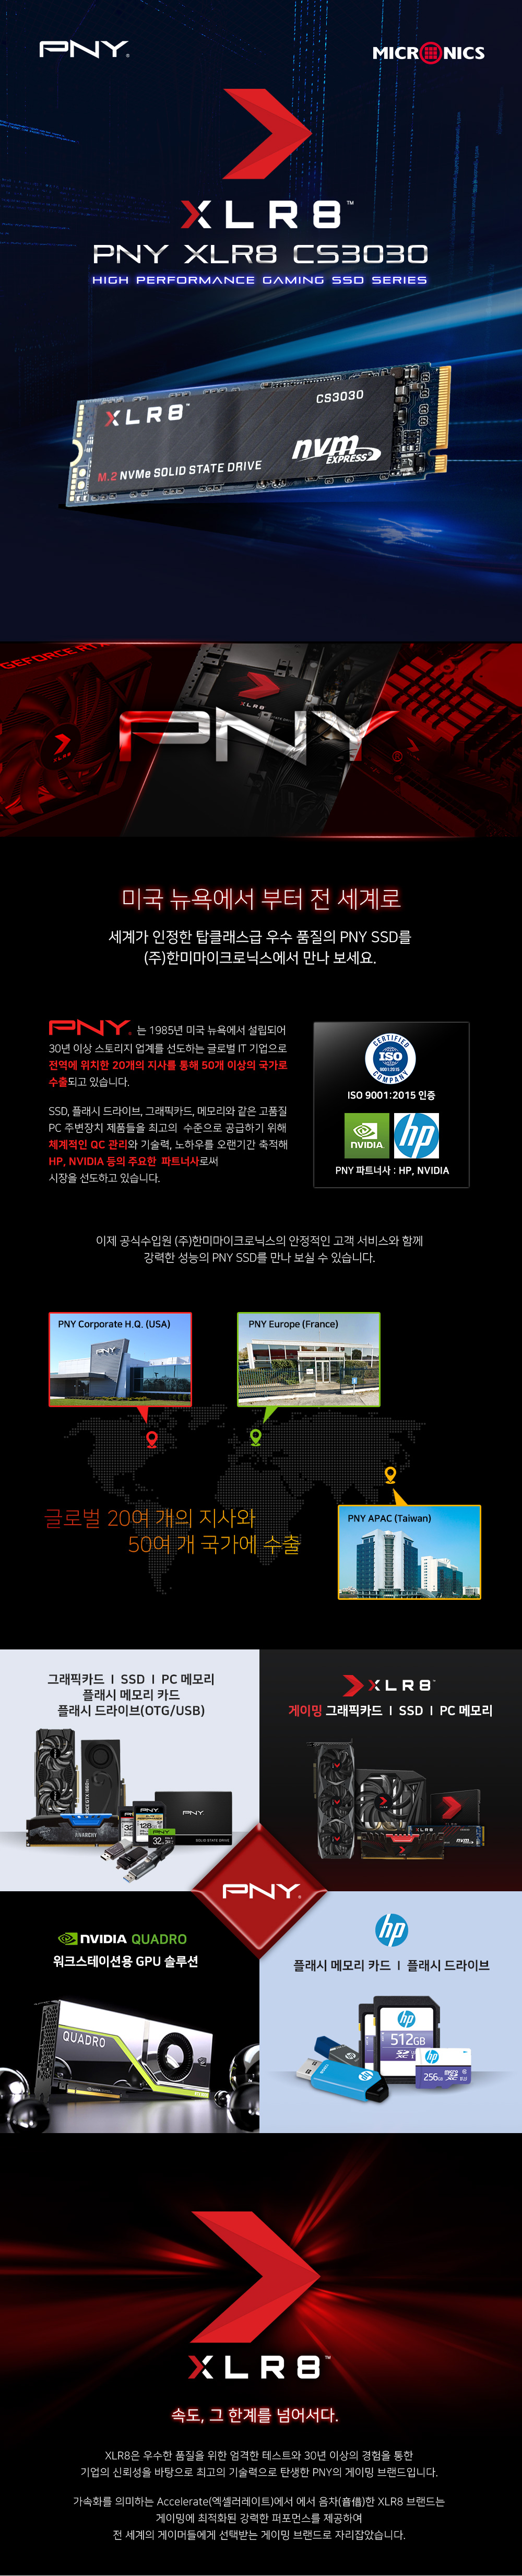 PNY XLR8 CS3030 M.2 NVMe (250GB)